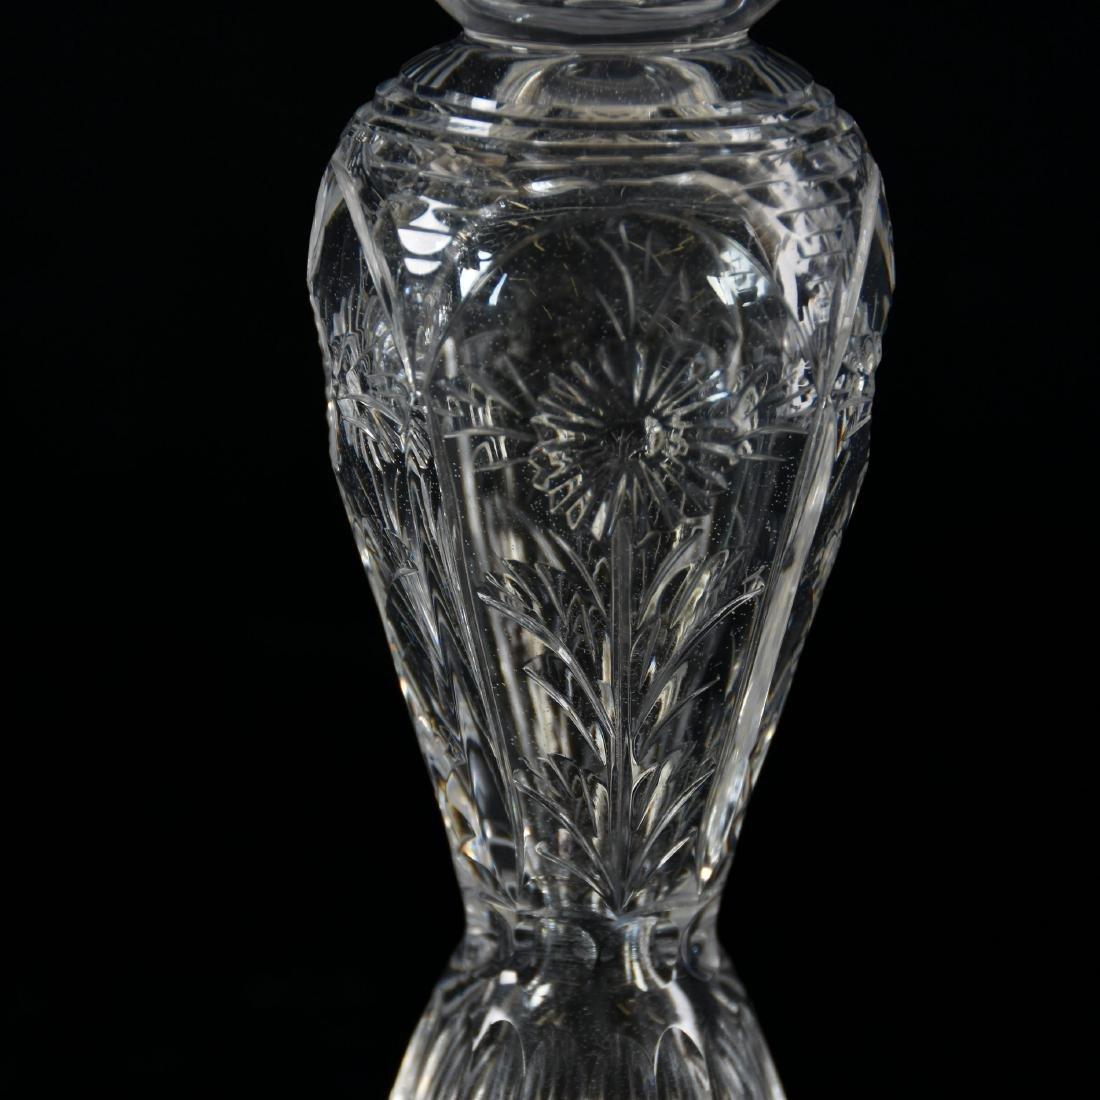 Pair Candlesticks, Engraved Floral Motif - 3